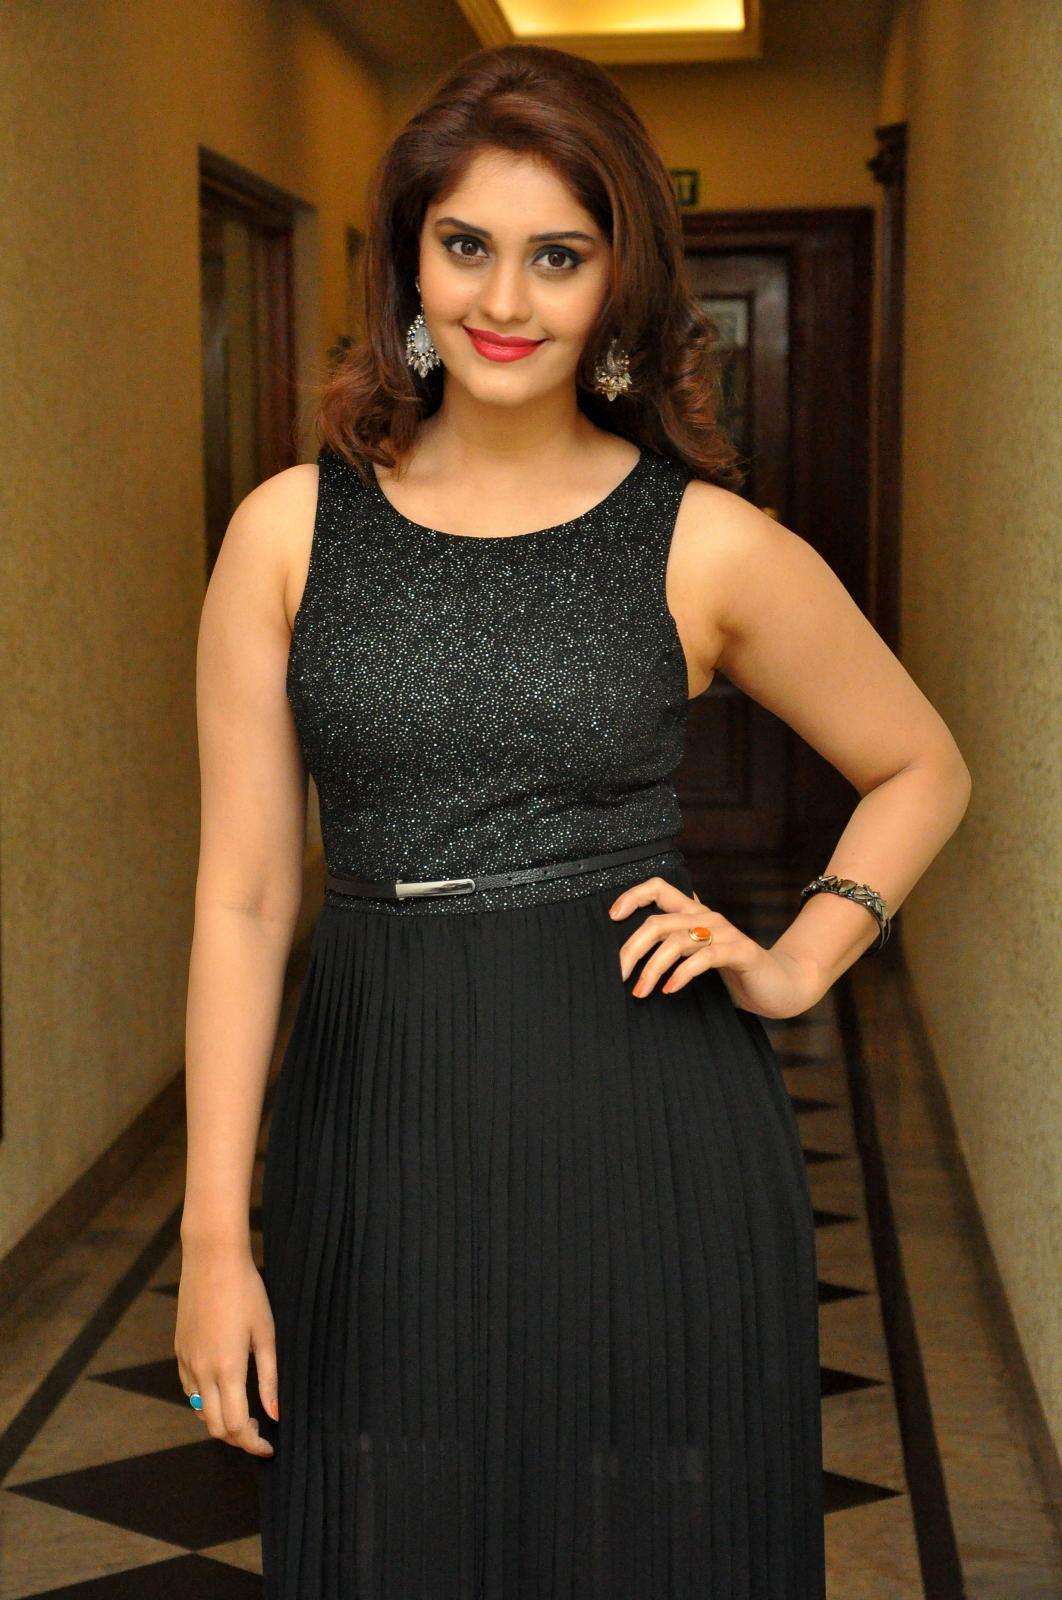 Actress Surabhi Hot Photo Gallery, Surabhi Wallpapers Hd -2349